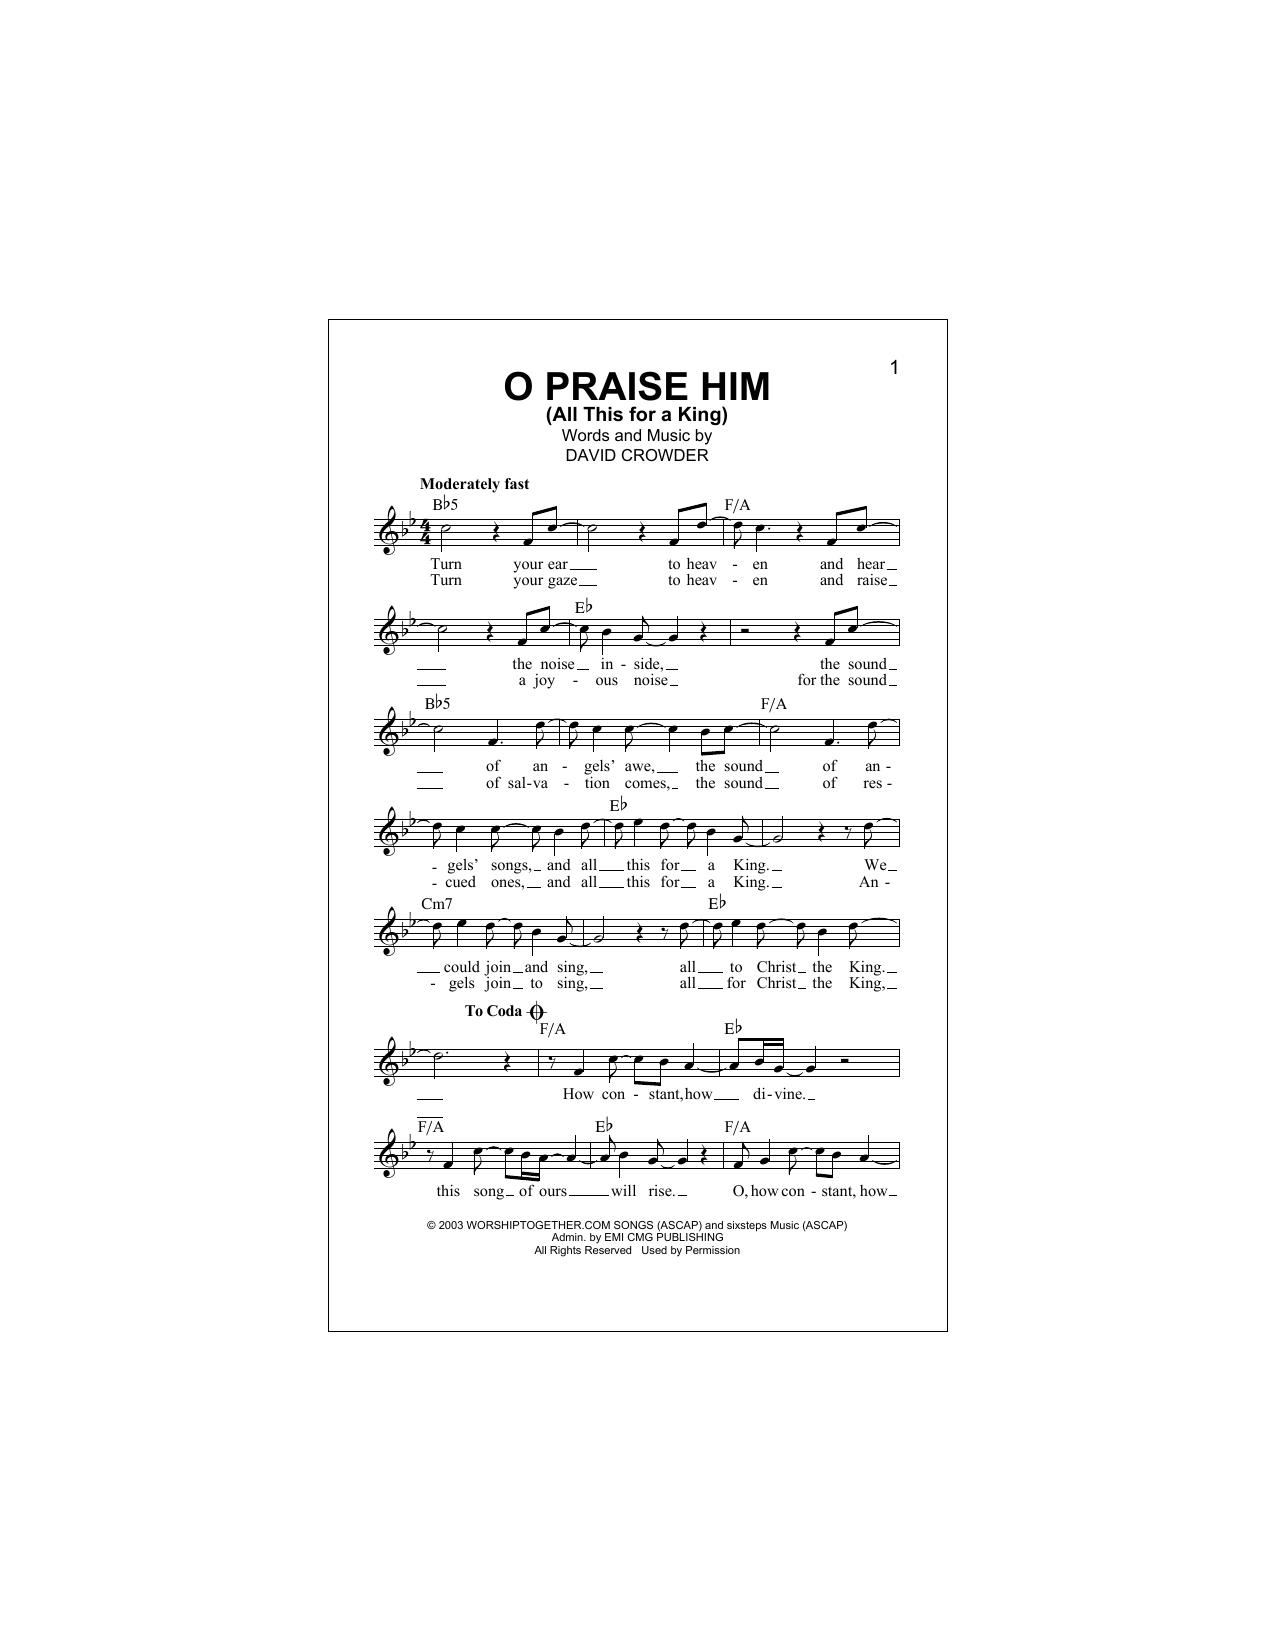 Sheet Music Digital Files To Print Licensed David Crowderband